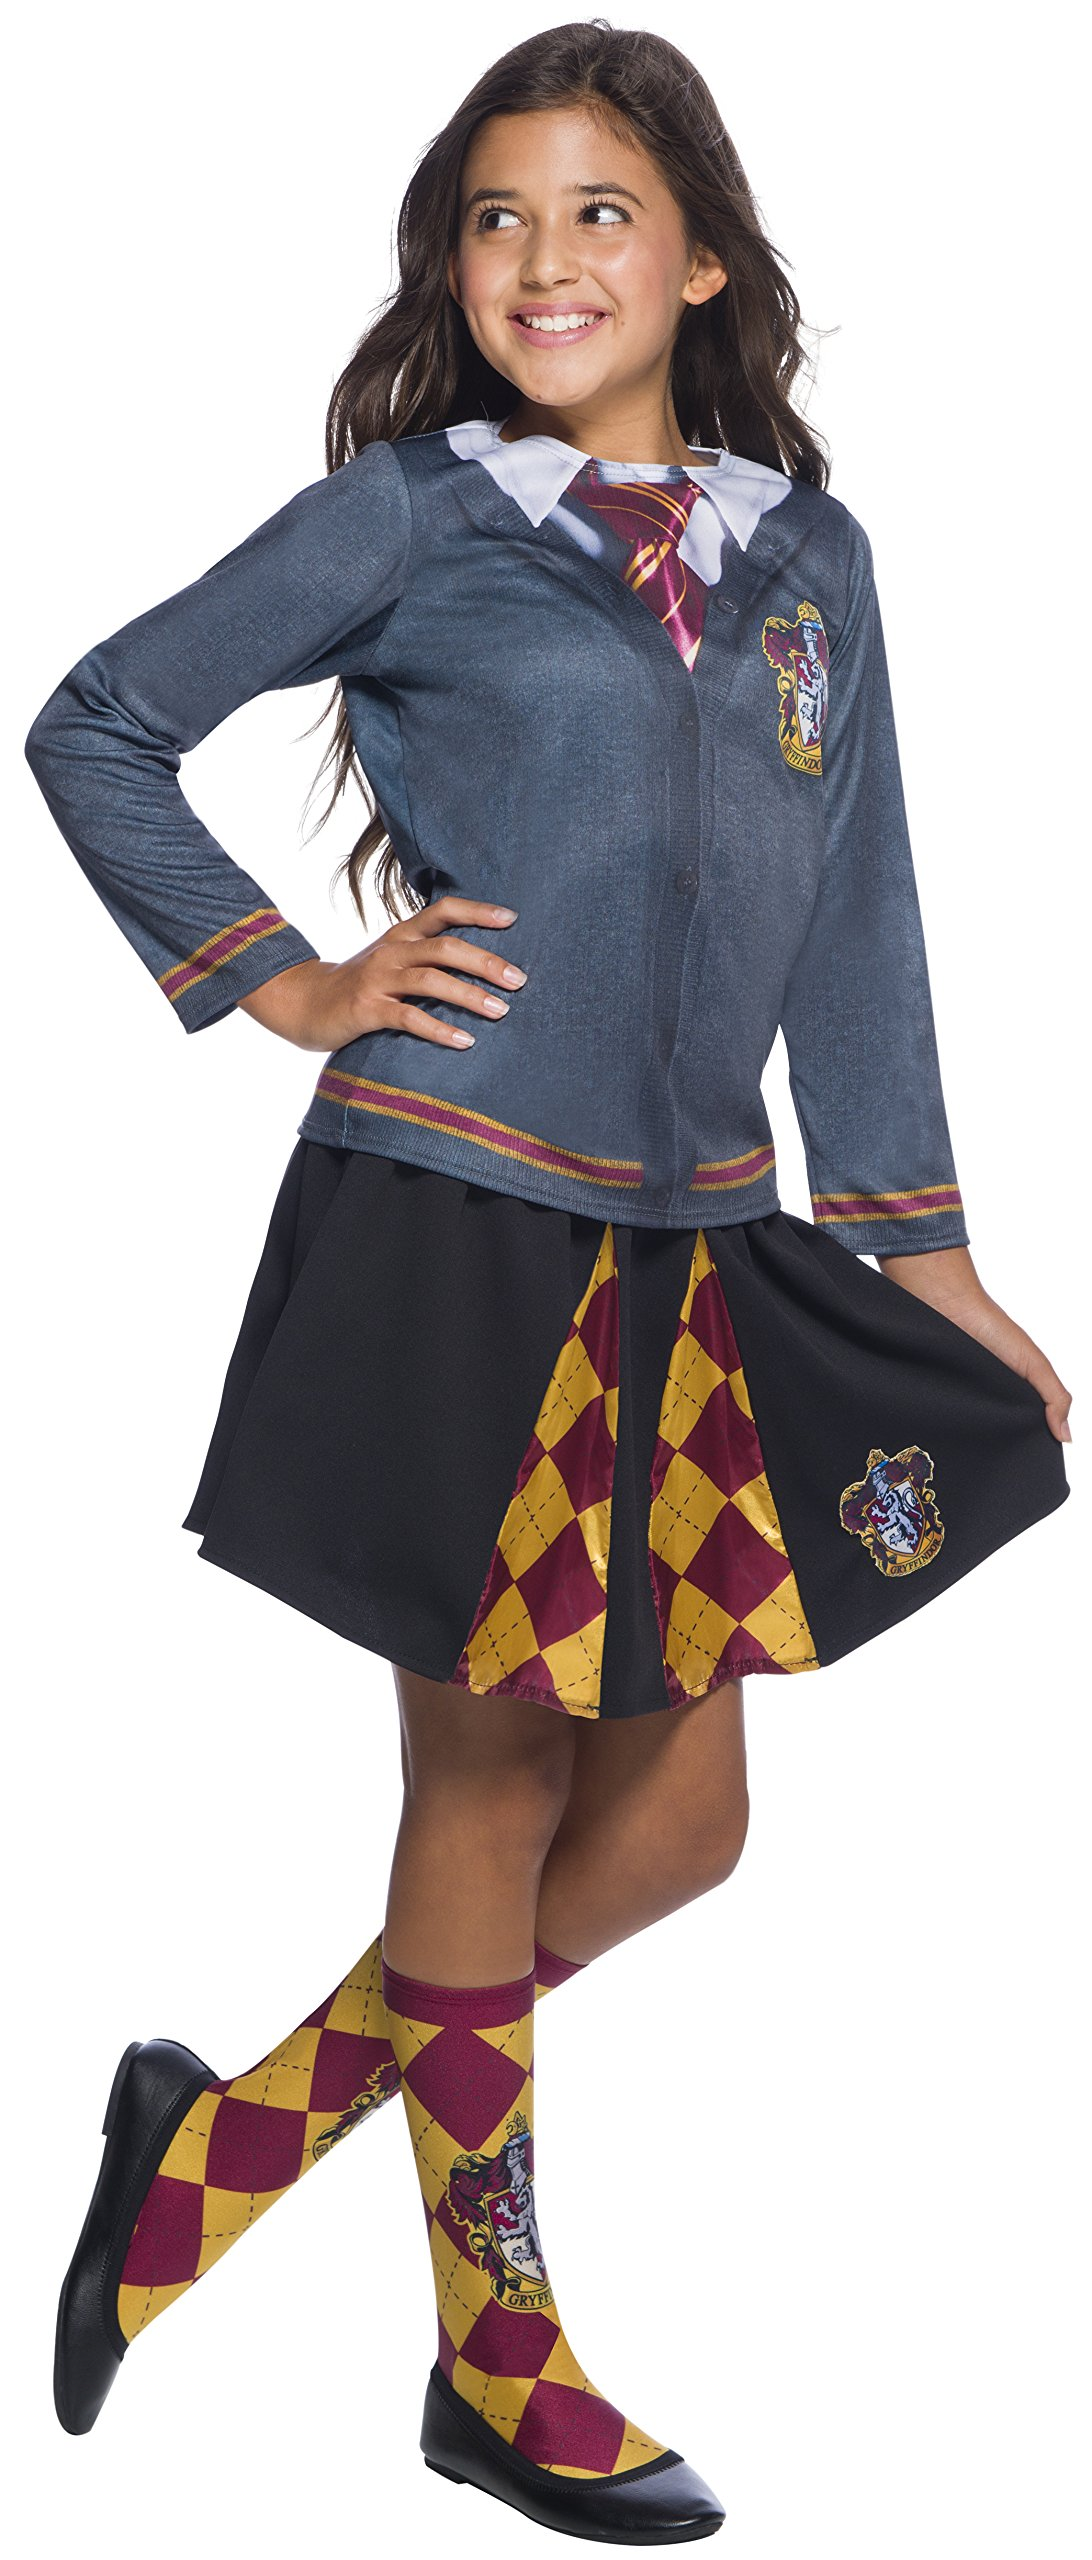 Rubie's Costume Co Girlsharrypotterskirt, Gryffindor, Onesize